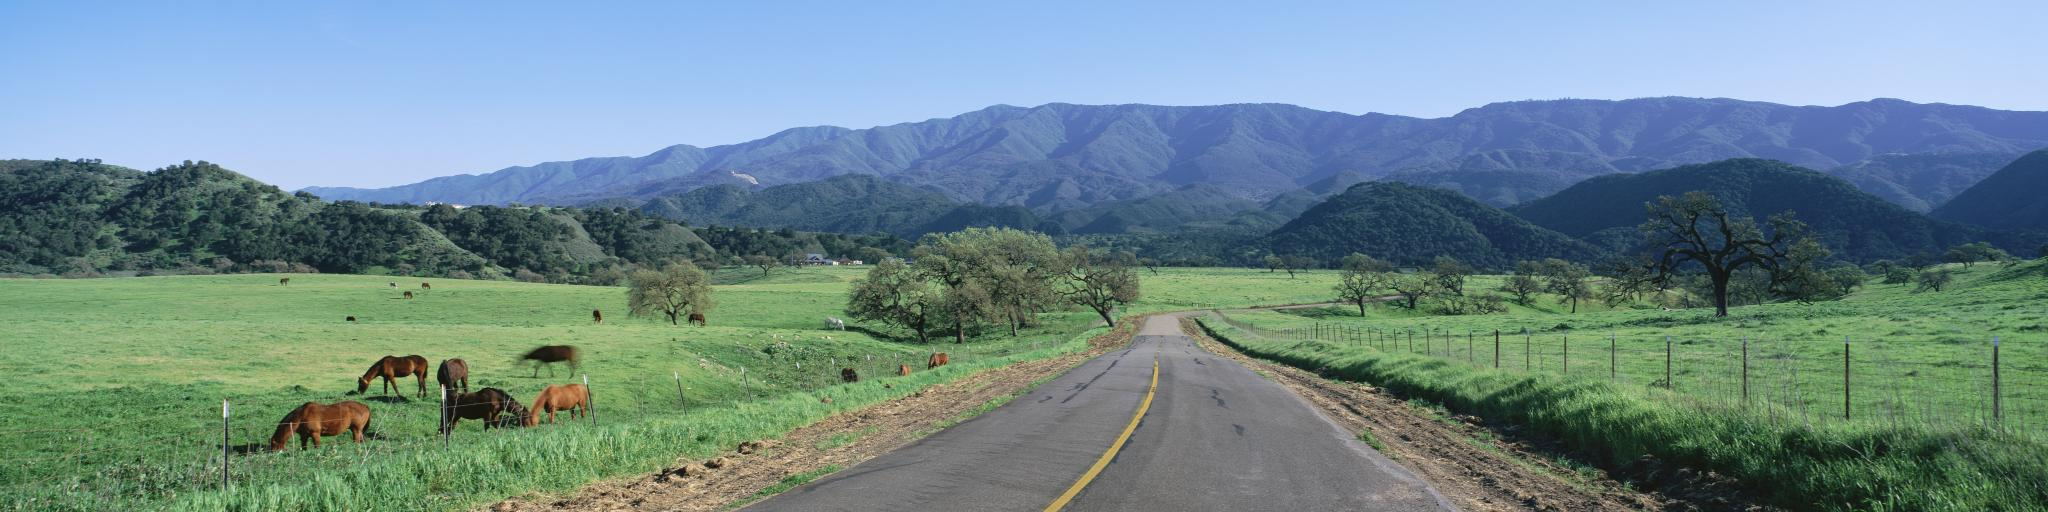 Scenic country road through California near Santa Barbara.